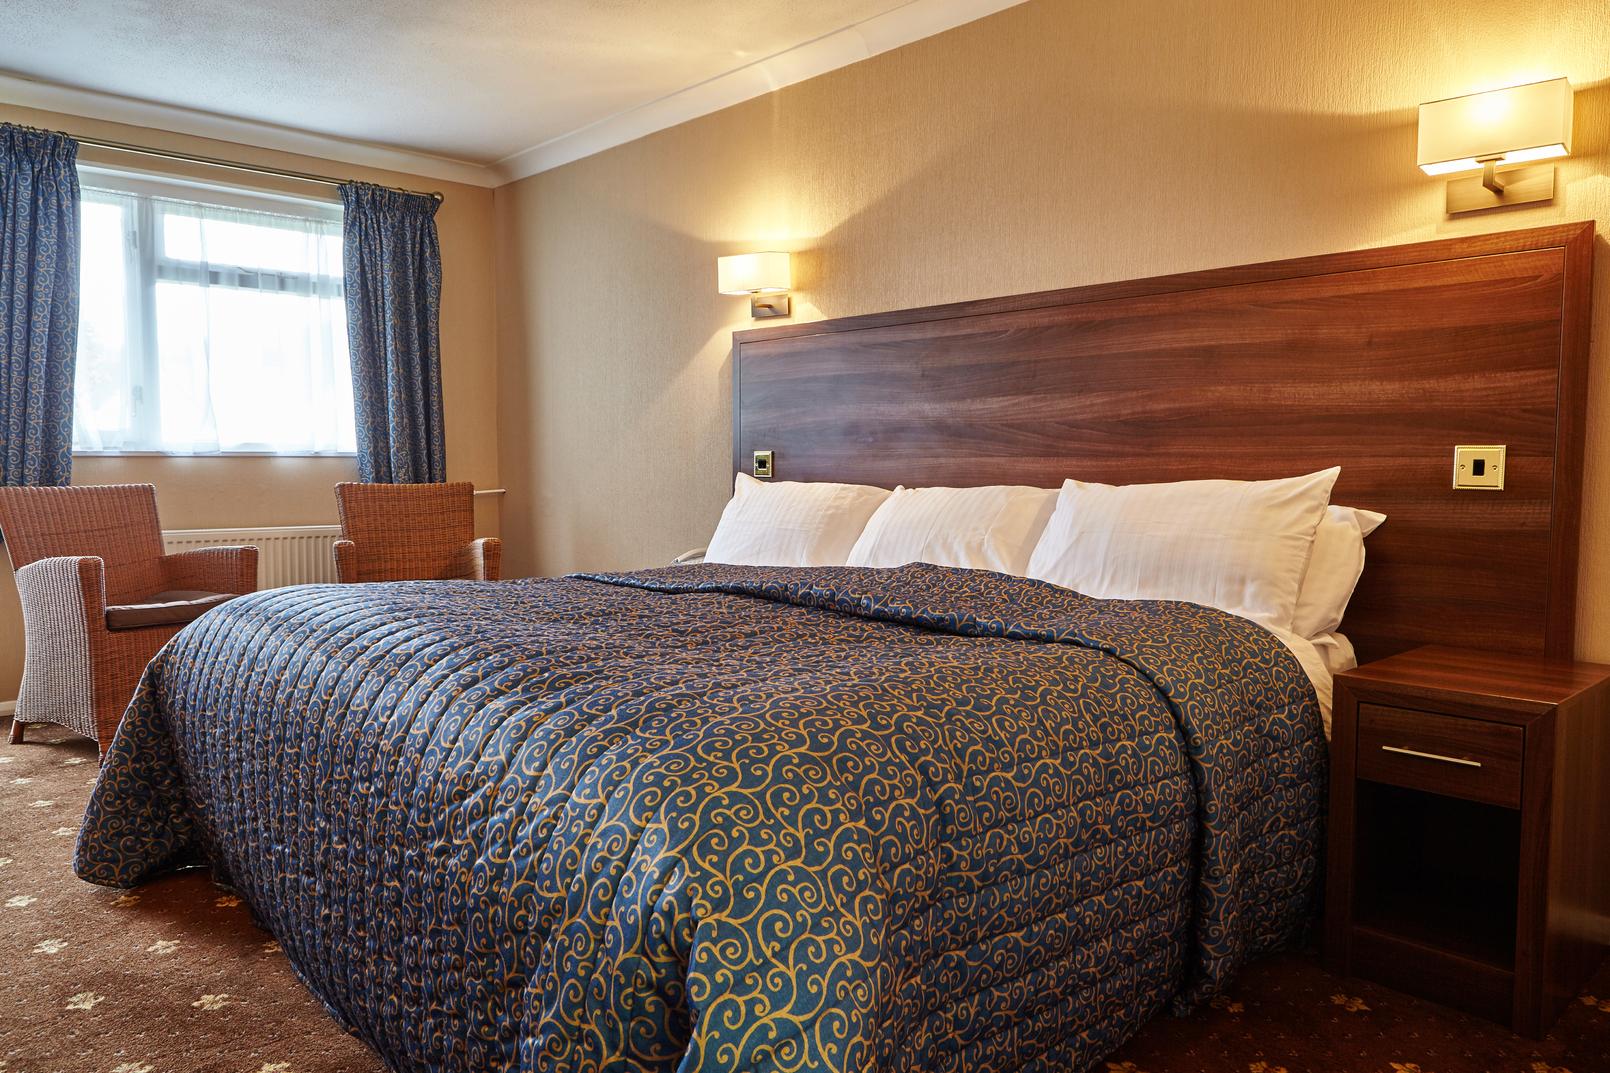 Best Western Royal George Hotel Tintern